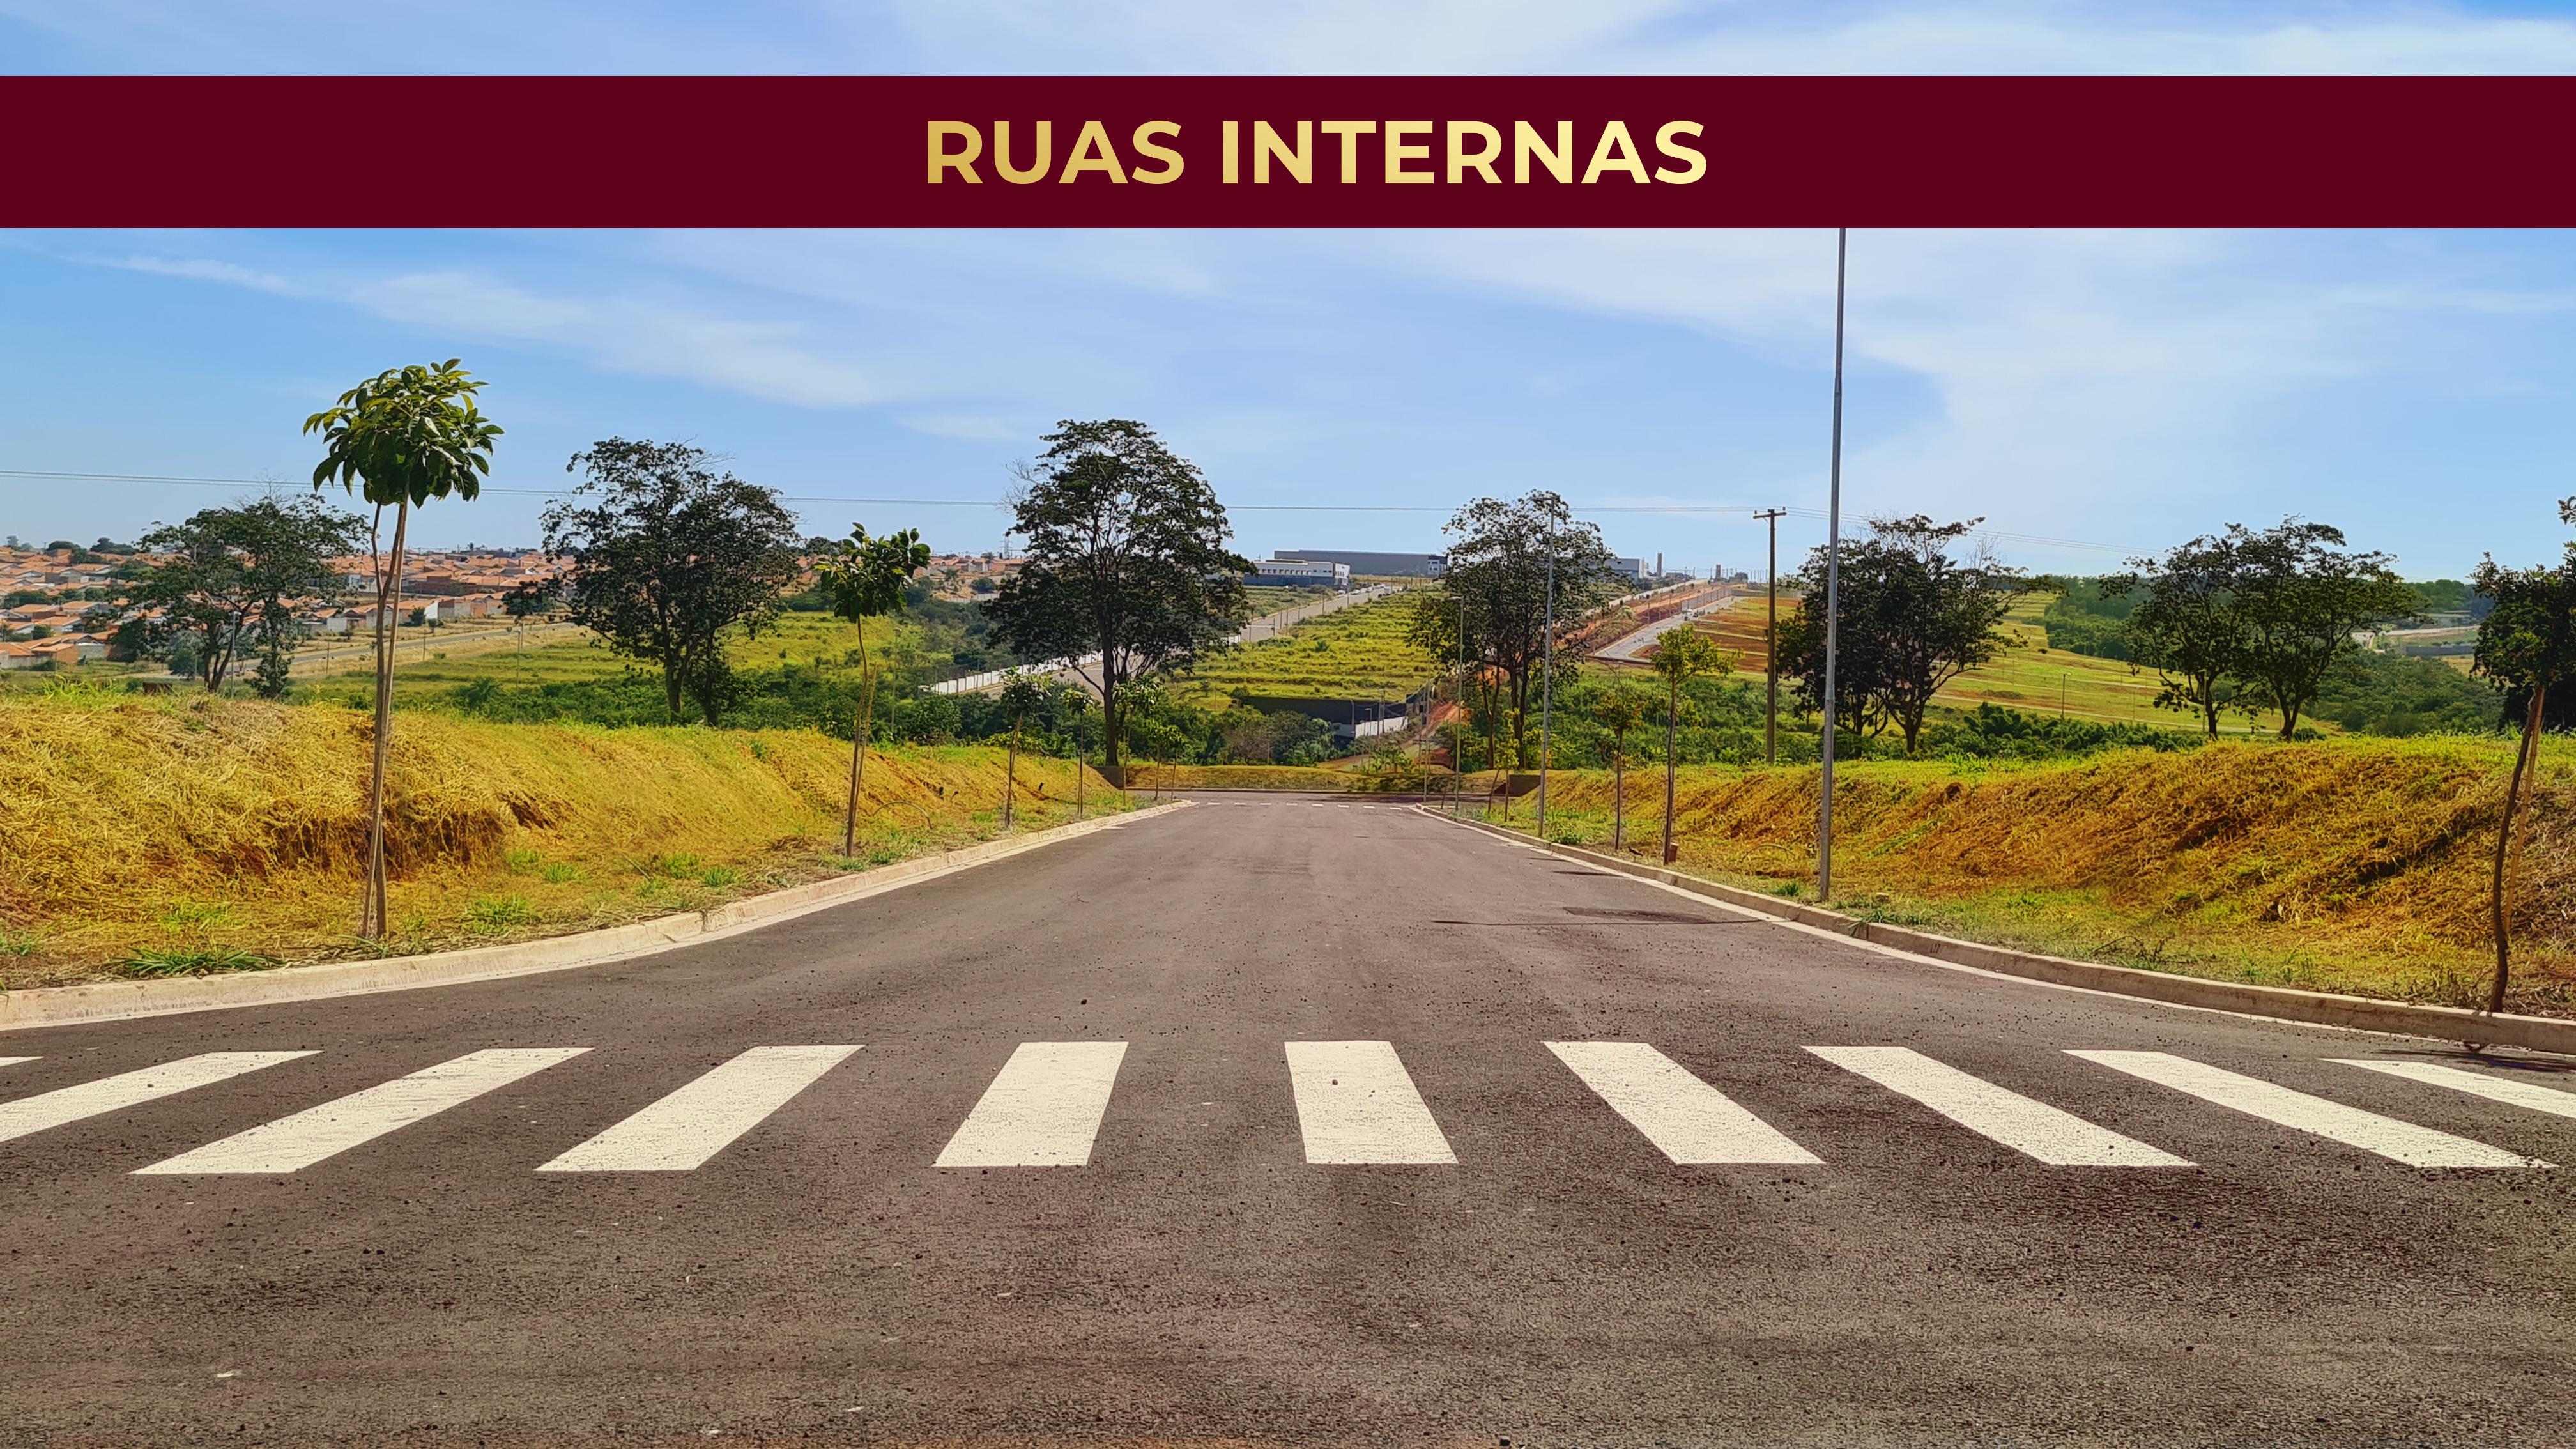 Ruas Internas